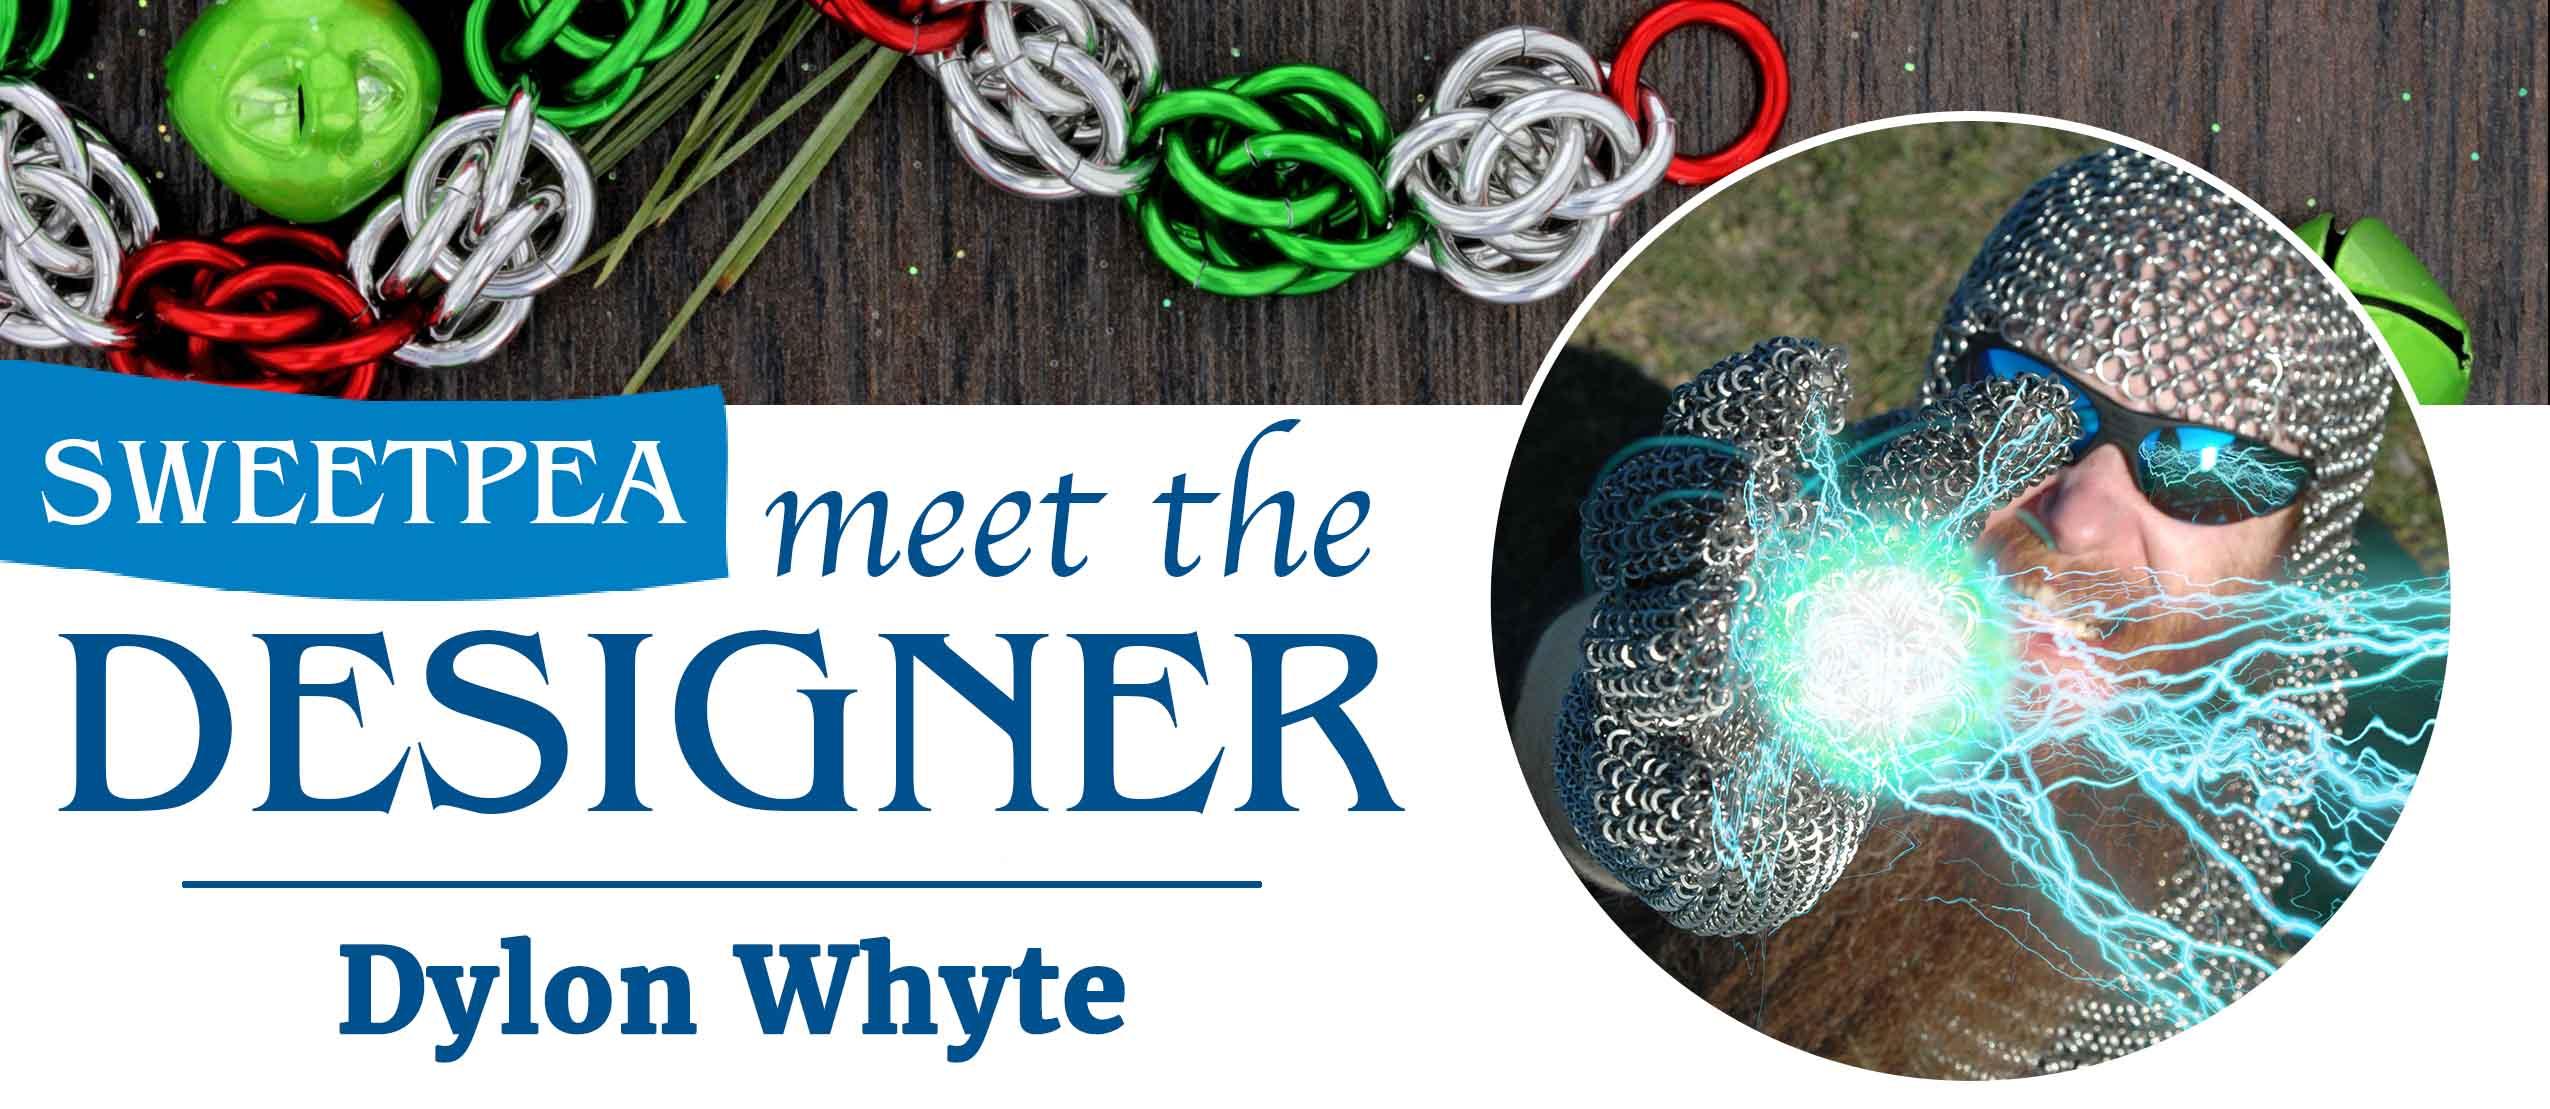 meet-the-designers-dylon-whyte-sweetpea-bracelet-kits.jpg